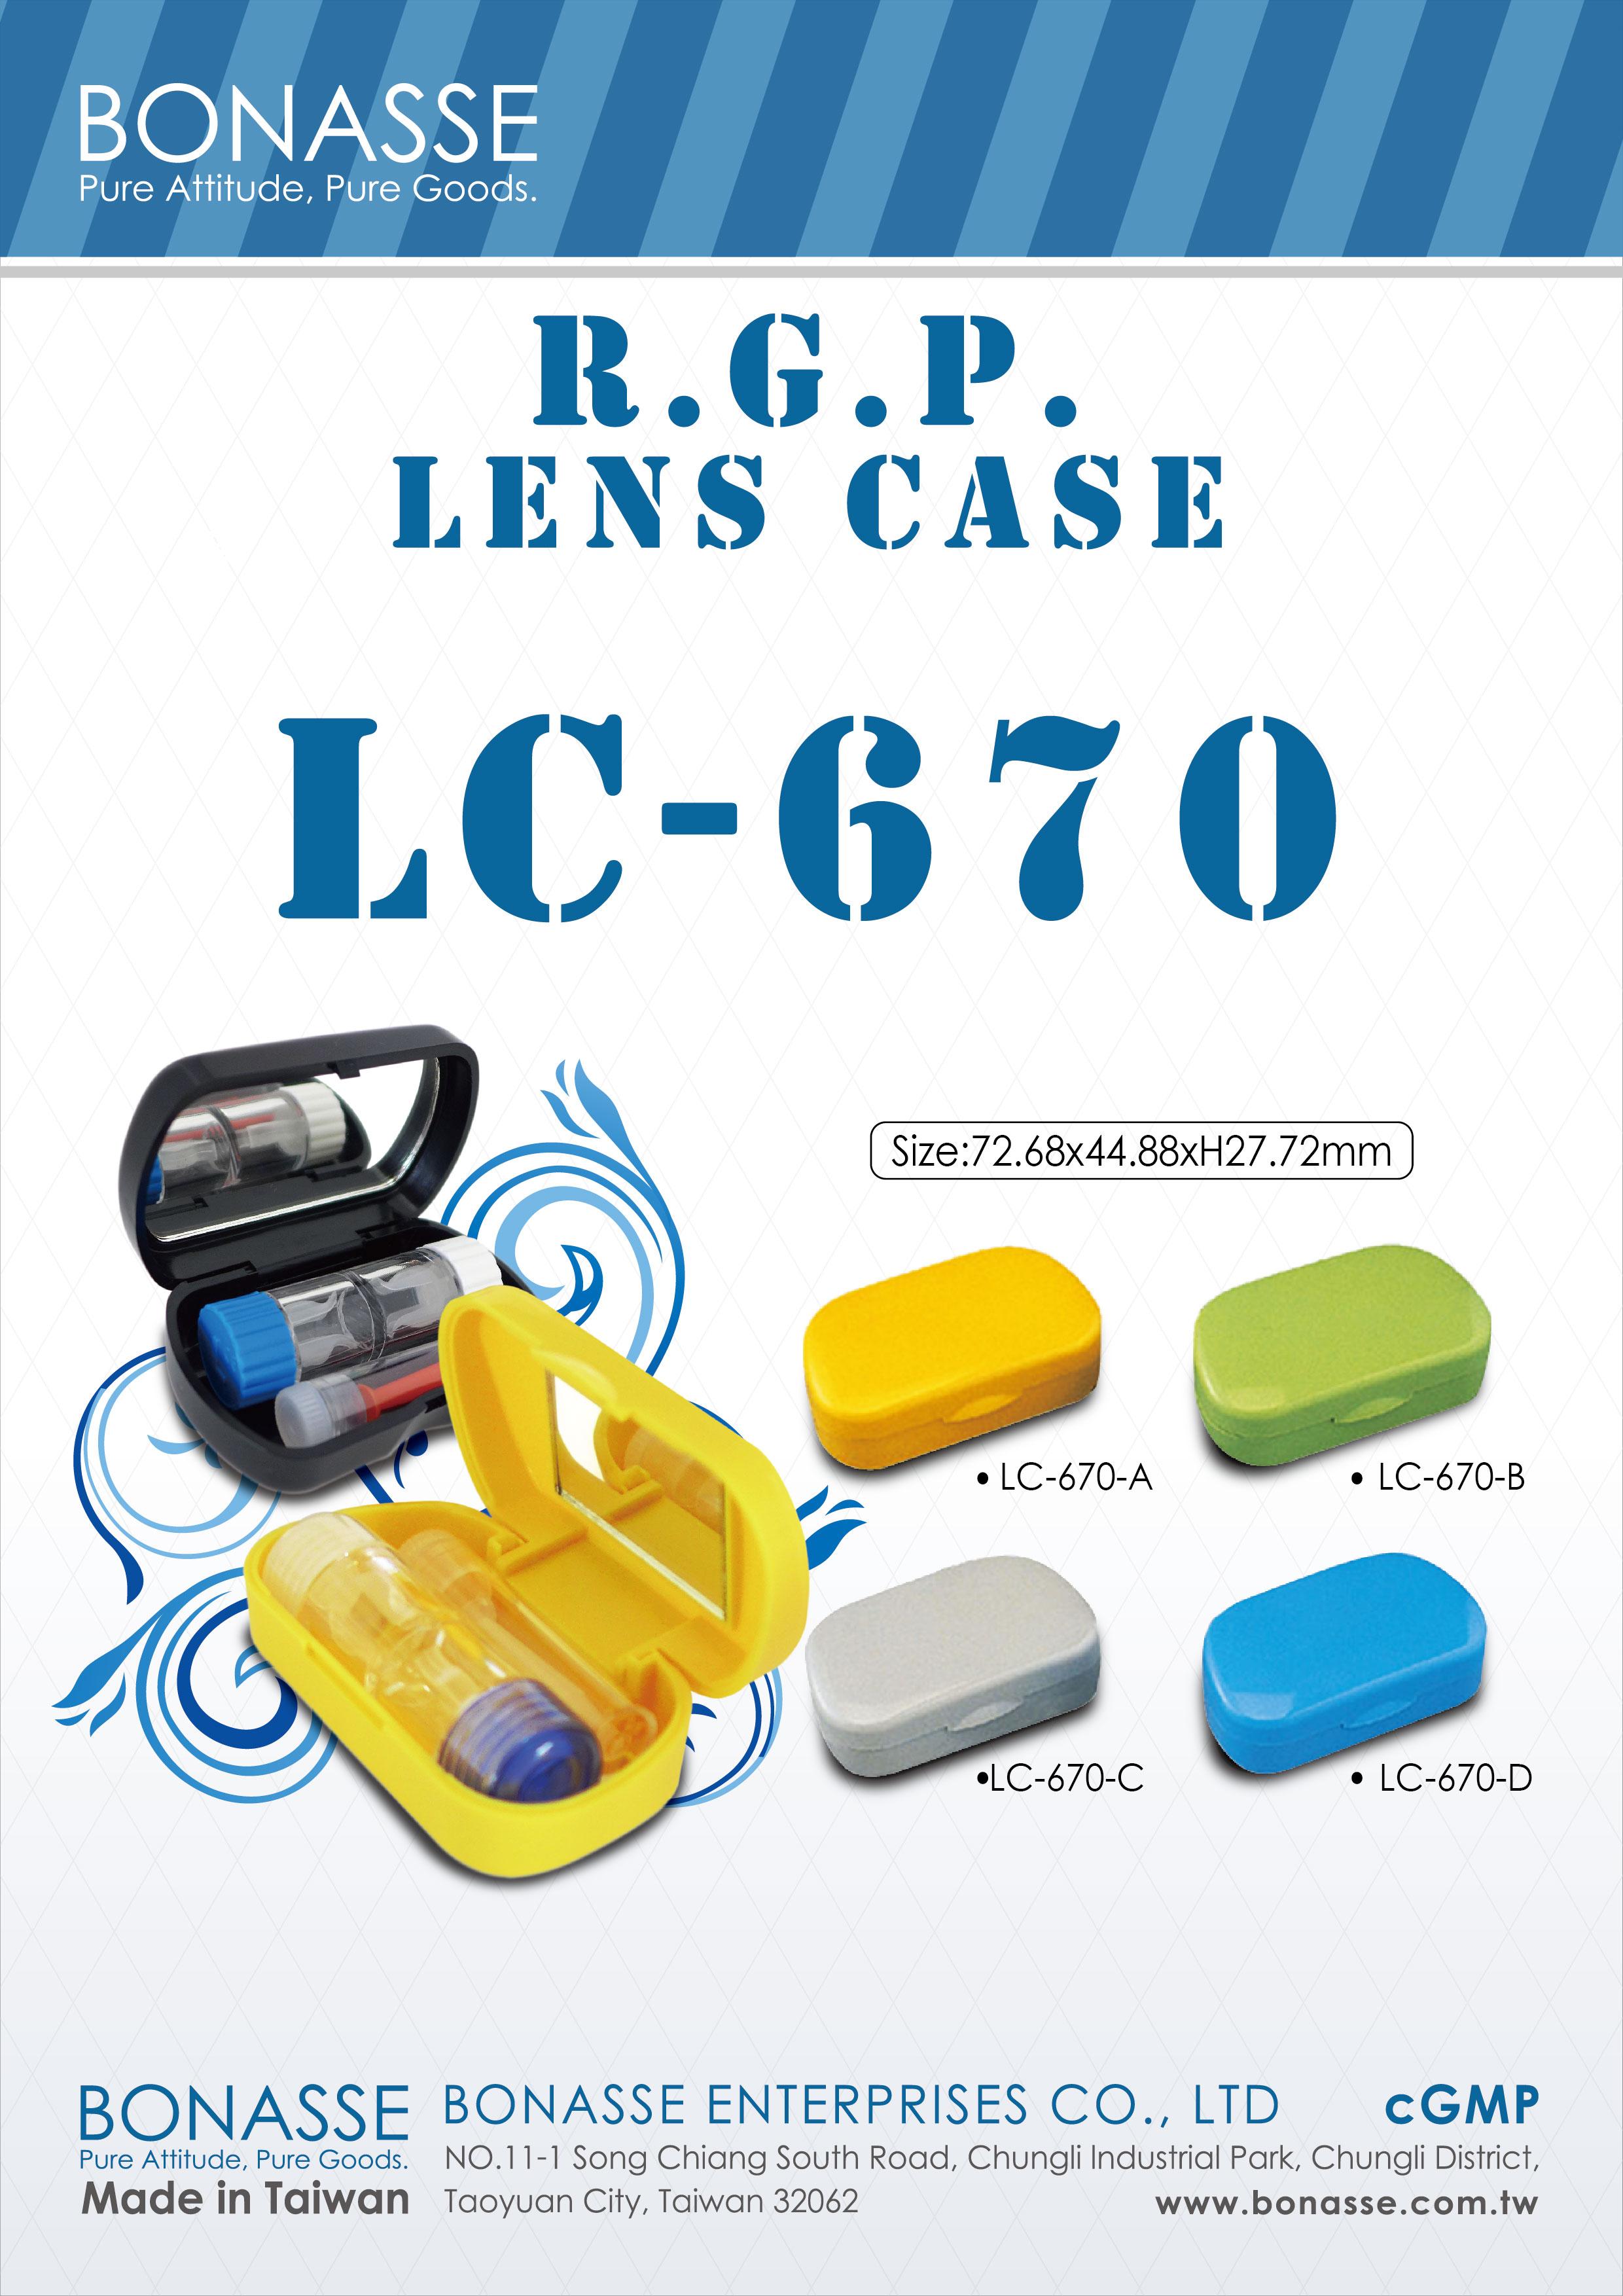 LC-670